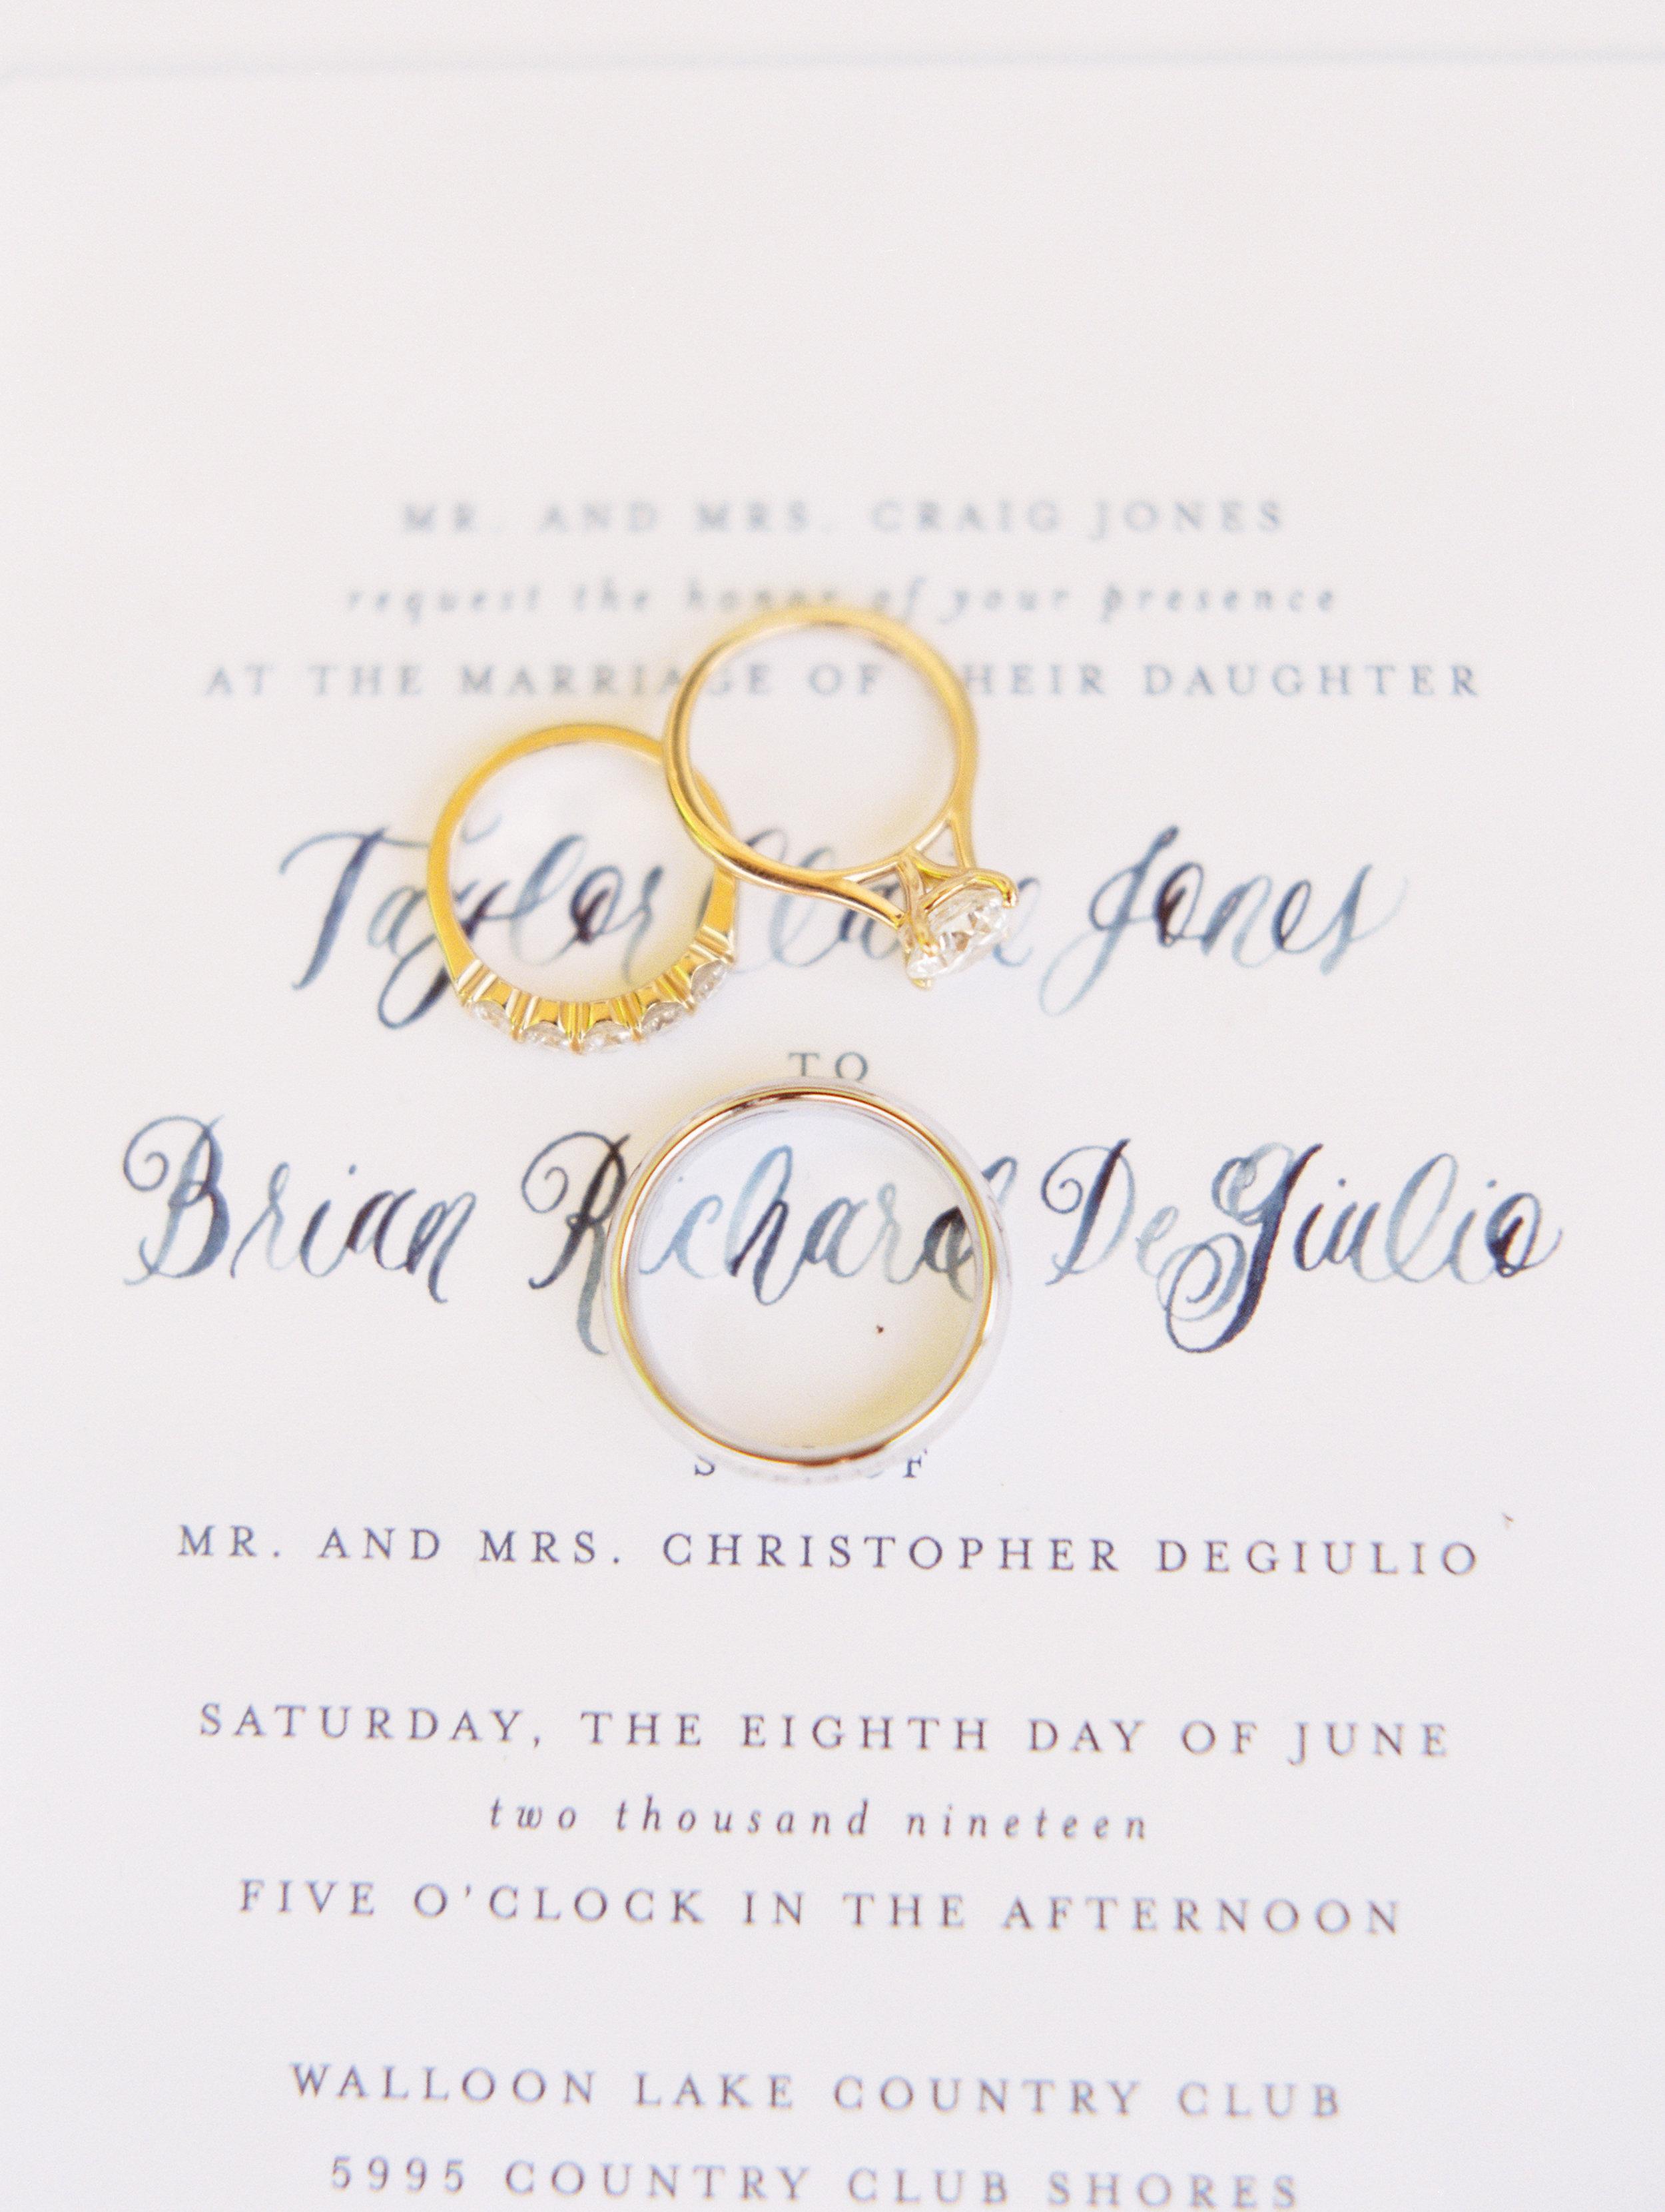 DeGuilio+Wedding+Detailsf-14 copy.jpg